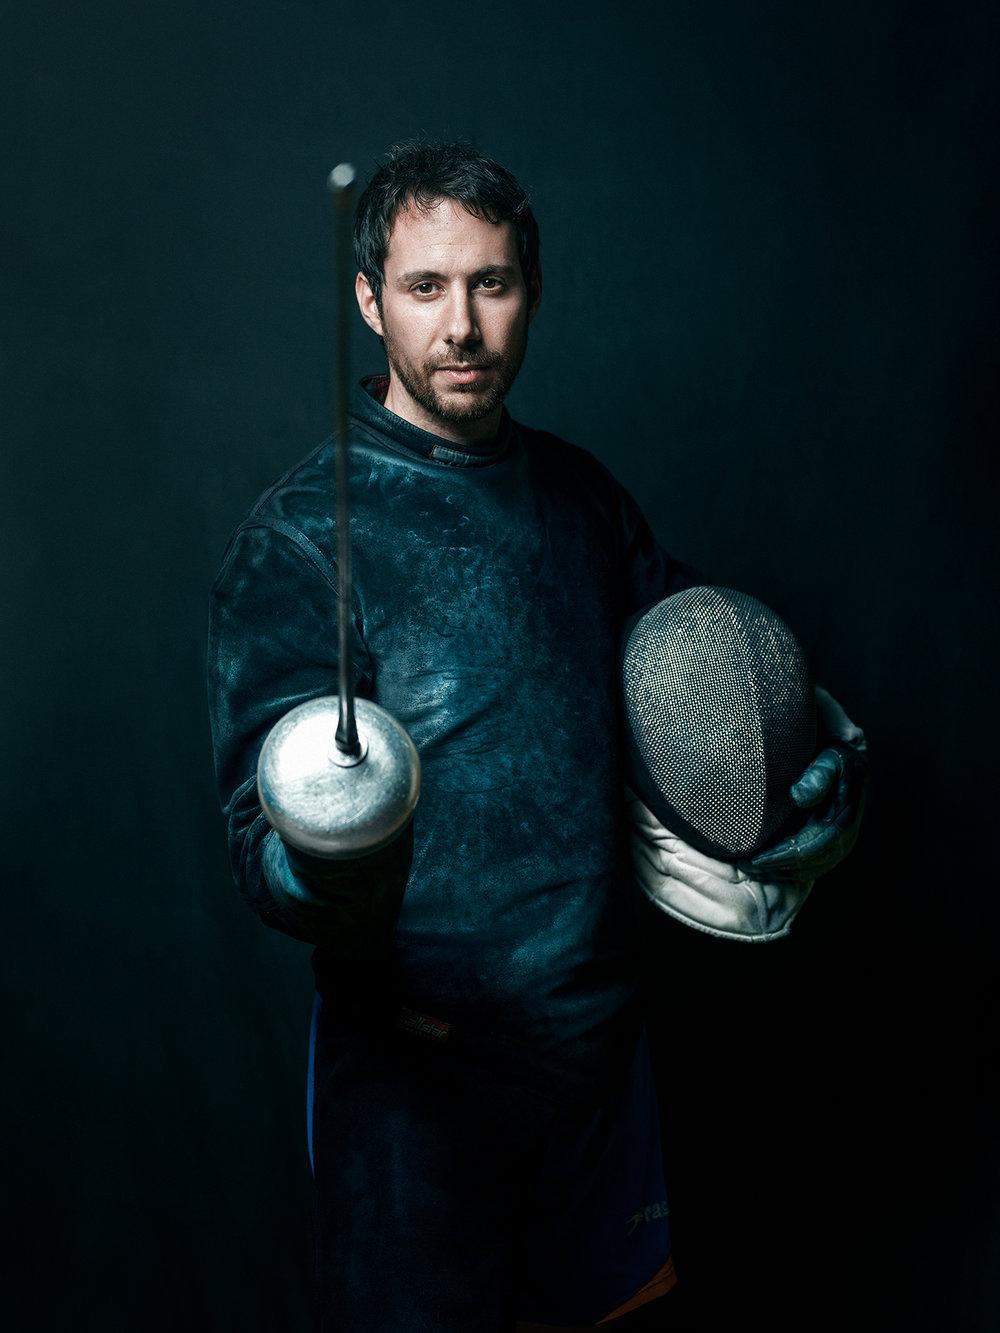 Oscar-arribas-esgrima-maestro-fencing-master-fencer-fechten-scherma-escrime-portrait-fotografo-retrato-photographer029.jpg